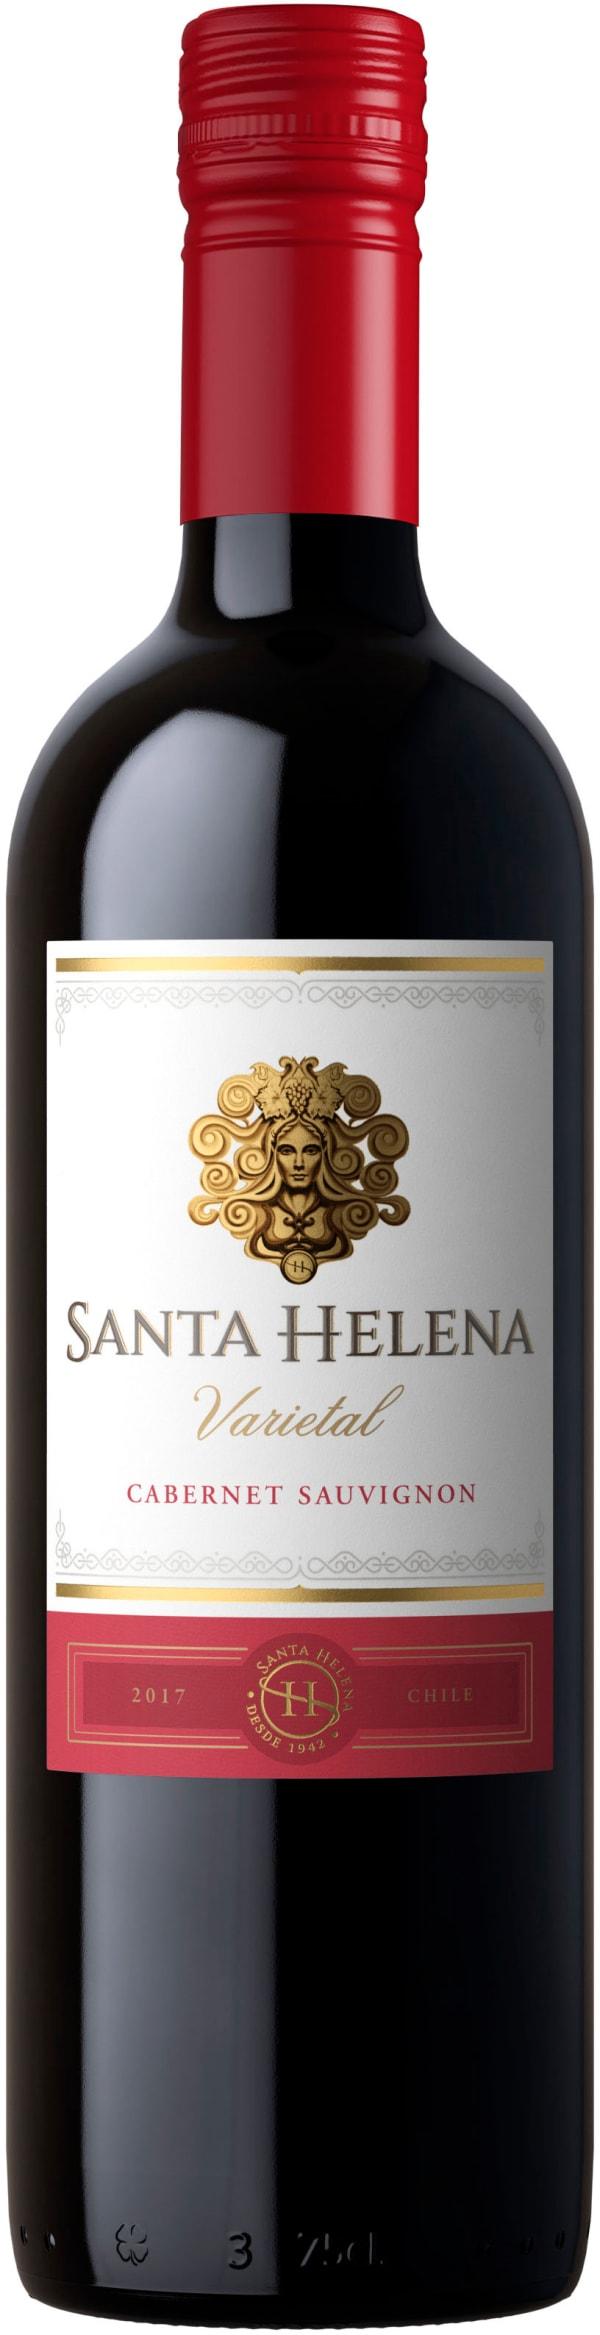 Santa Helena Varietal Cabernet Sauvignon 2018